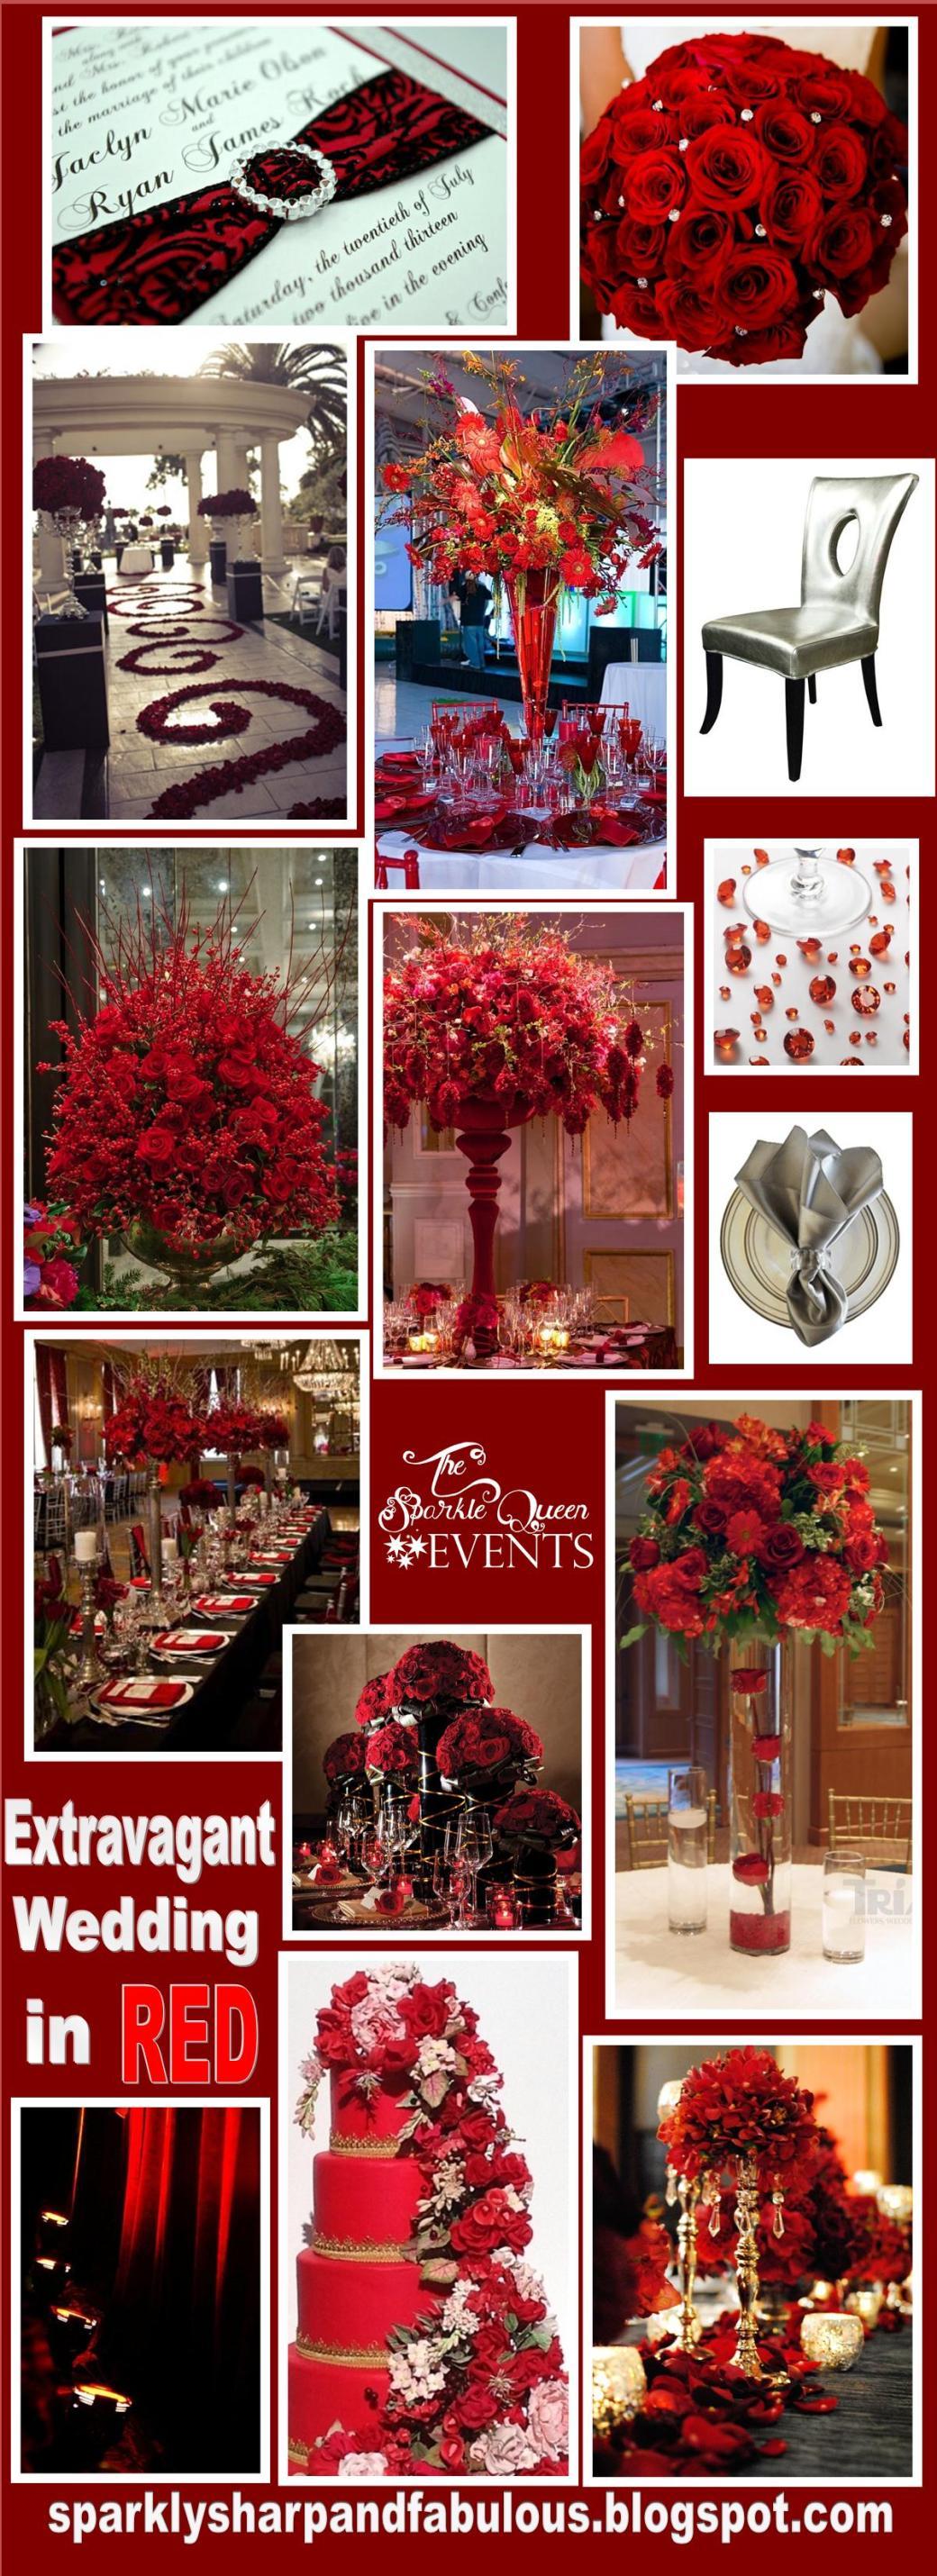 Extravagant Wedding in Red